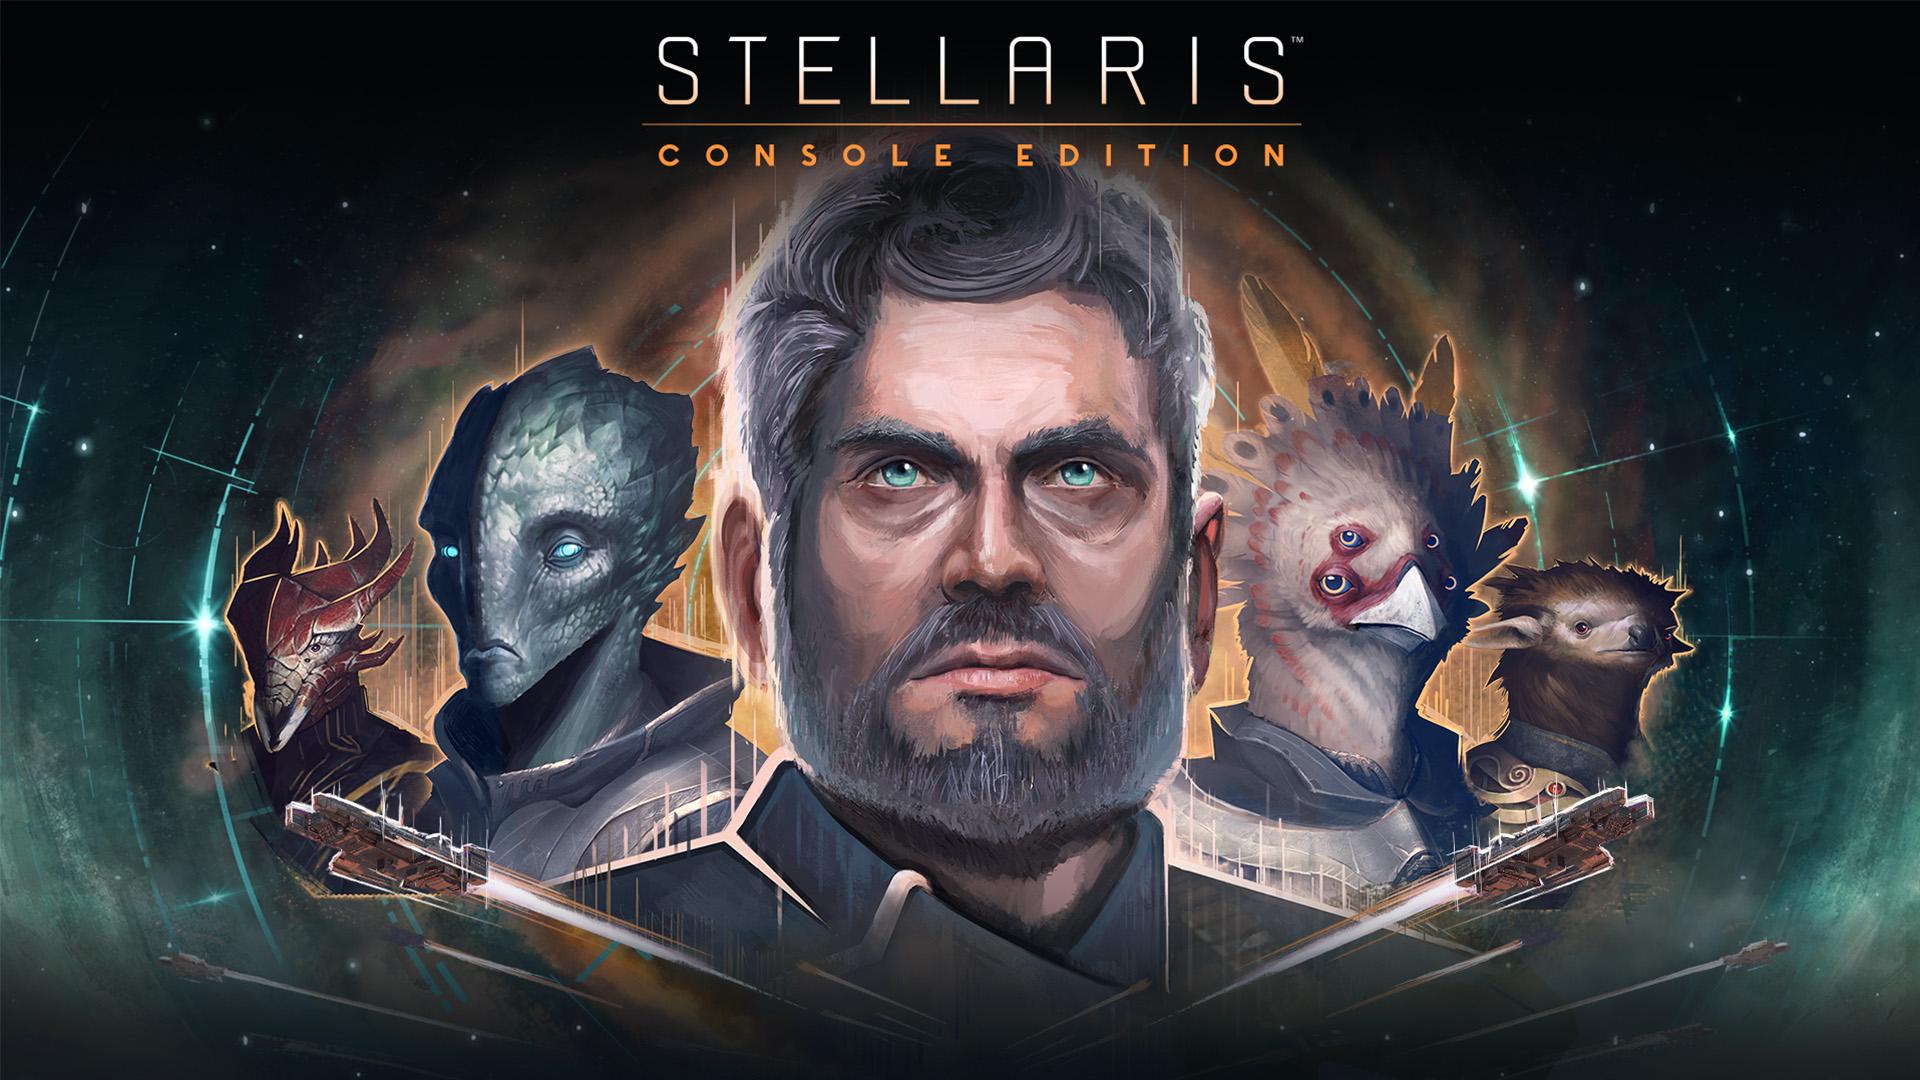 Stellaris Console Edition Key Art